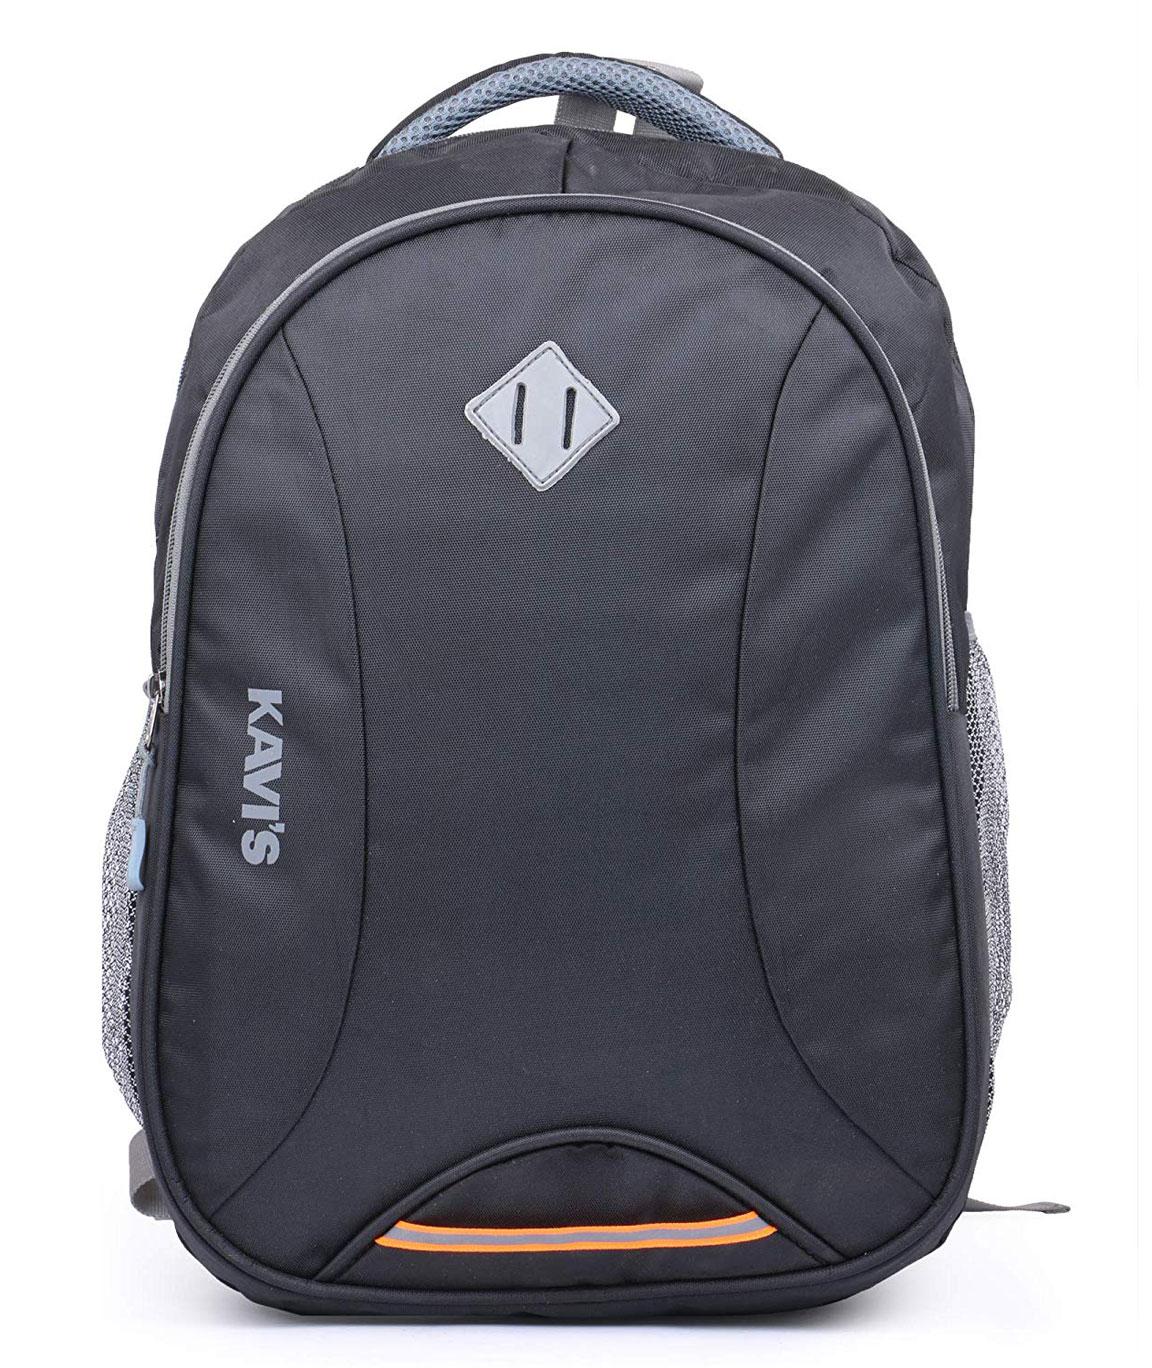 Kavi`s Laptop Backpack   Bag for Girls and Boys   School Bag for Kids with Rain Cover (Black)